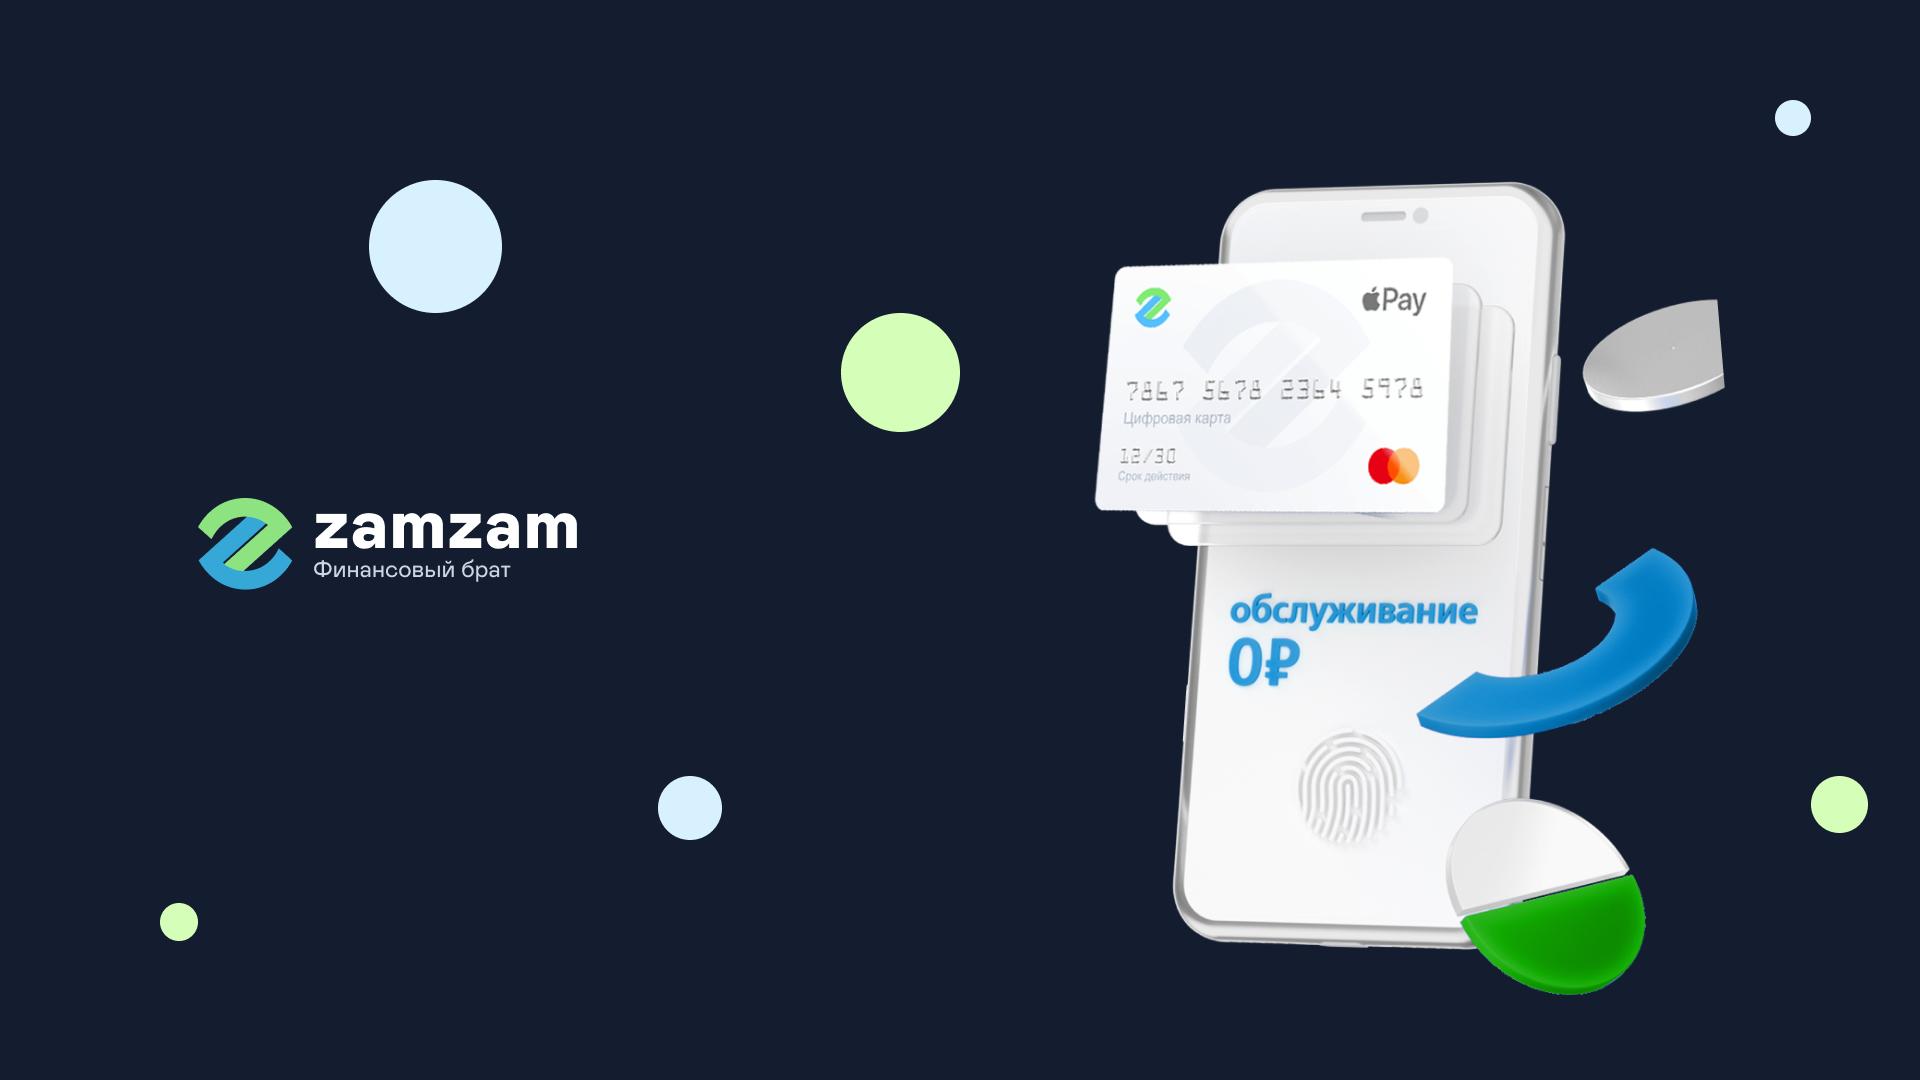 birtualnaja karta zamzam1 2 - Банковская карта для мигрантов от Zamzam – просто, быстро, доступно